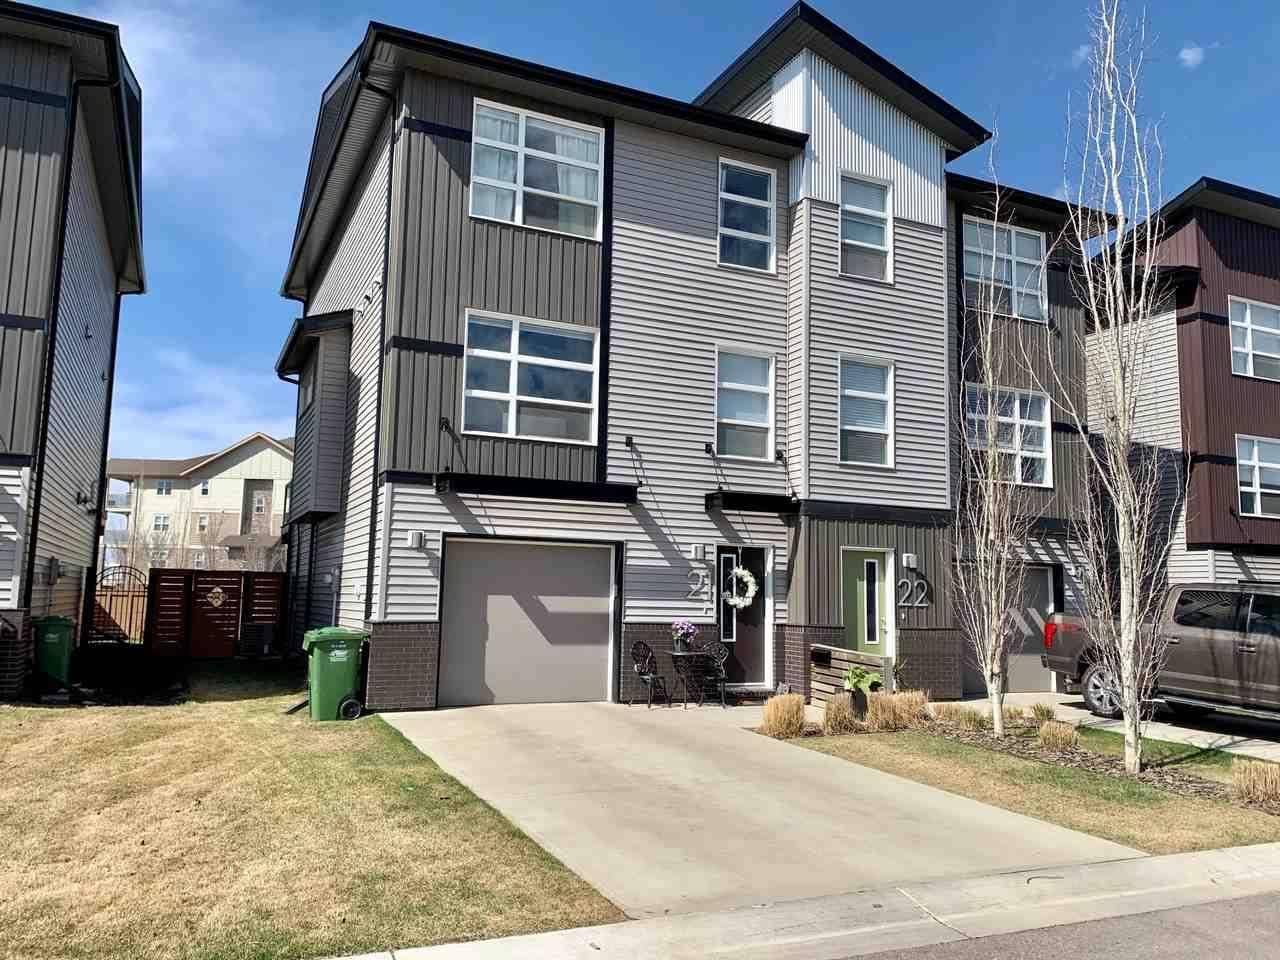 Townhouse for sale at 7 Nevada Pl Unit 21 St. Albert Alberta - MLS: E4190440